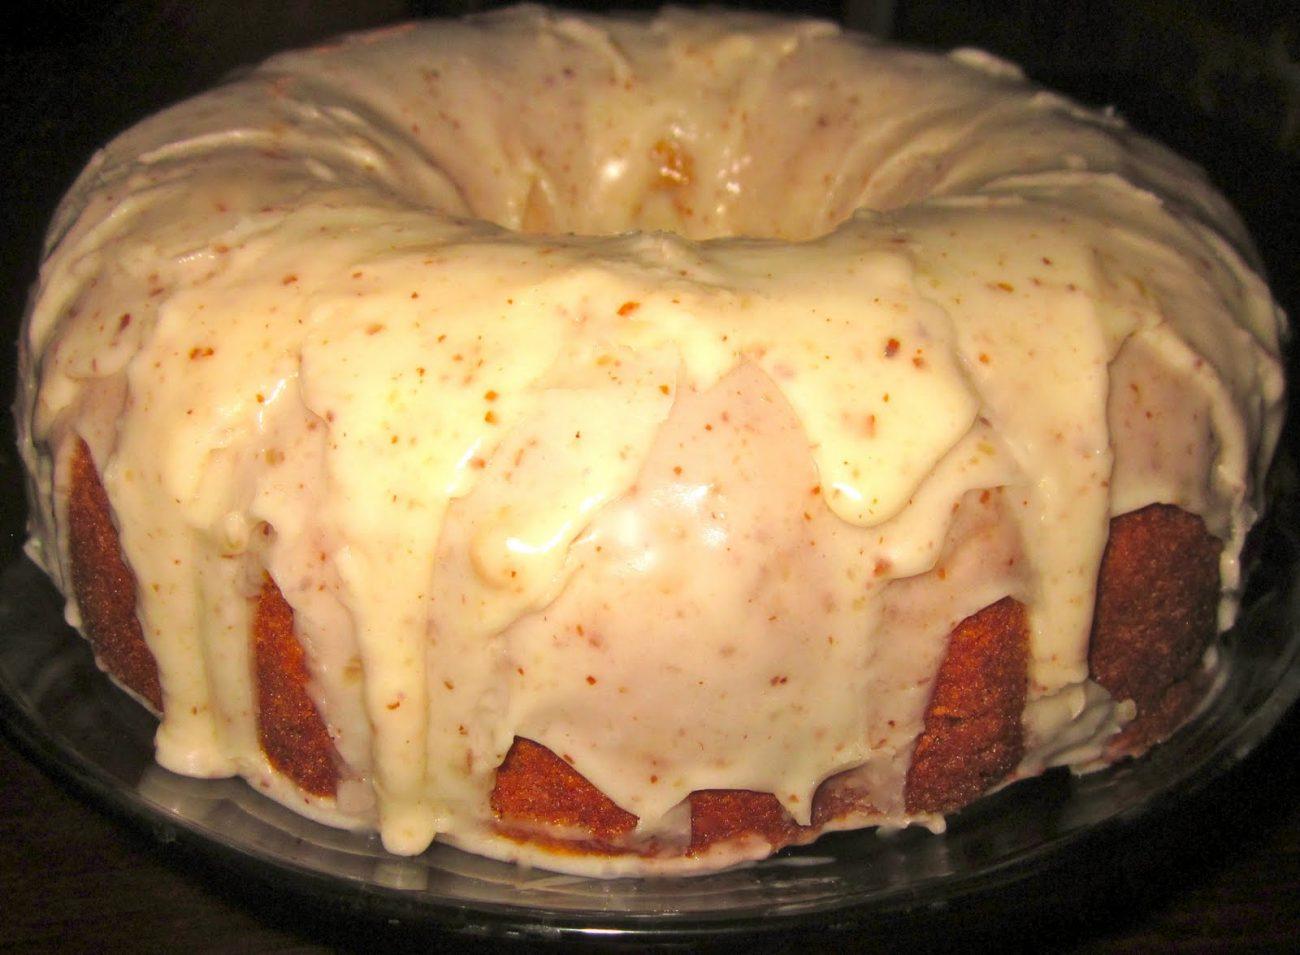 Almond Poundcake with Creamy Almond